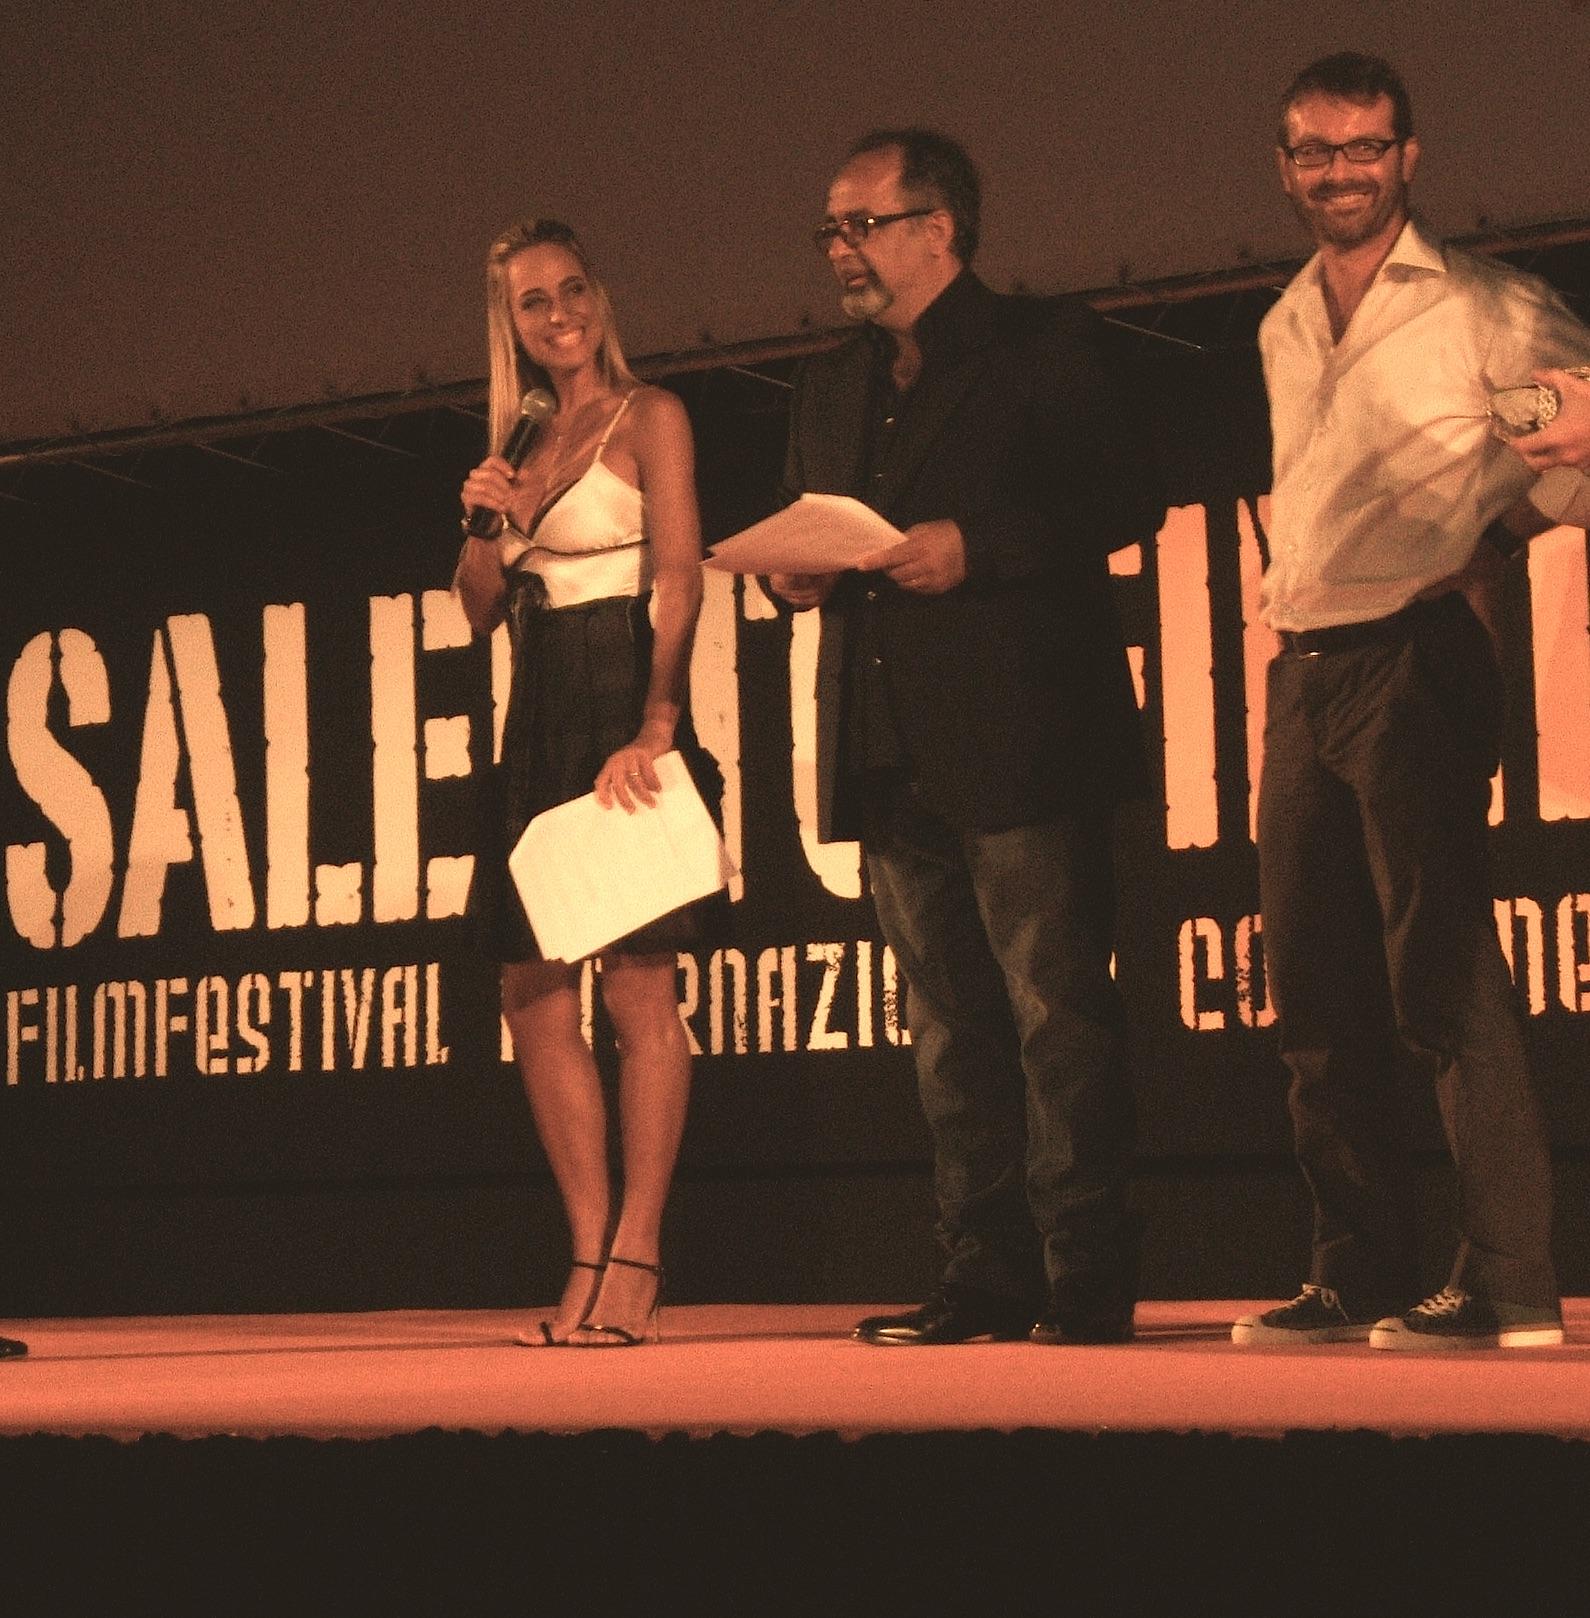 Jessica hosts the Salento Finibus Terrae International Film Festival